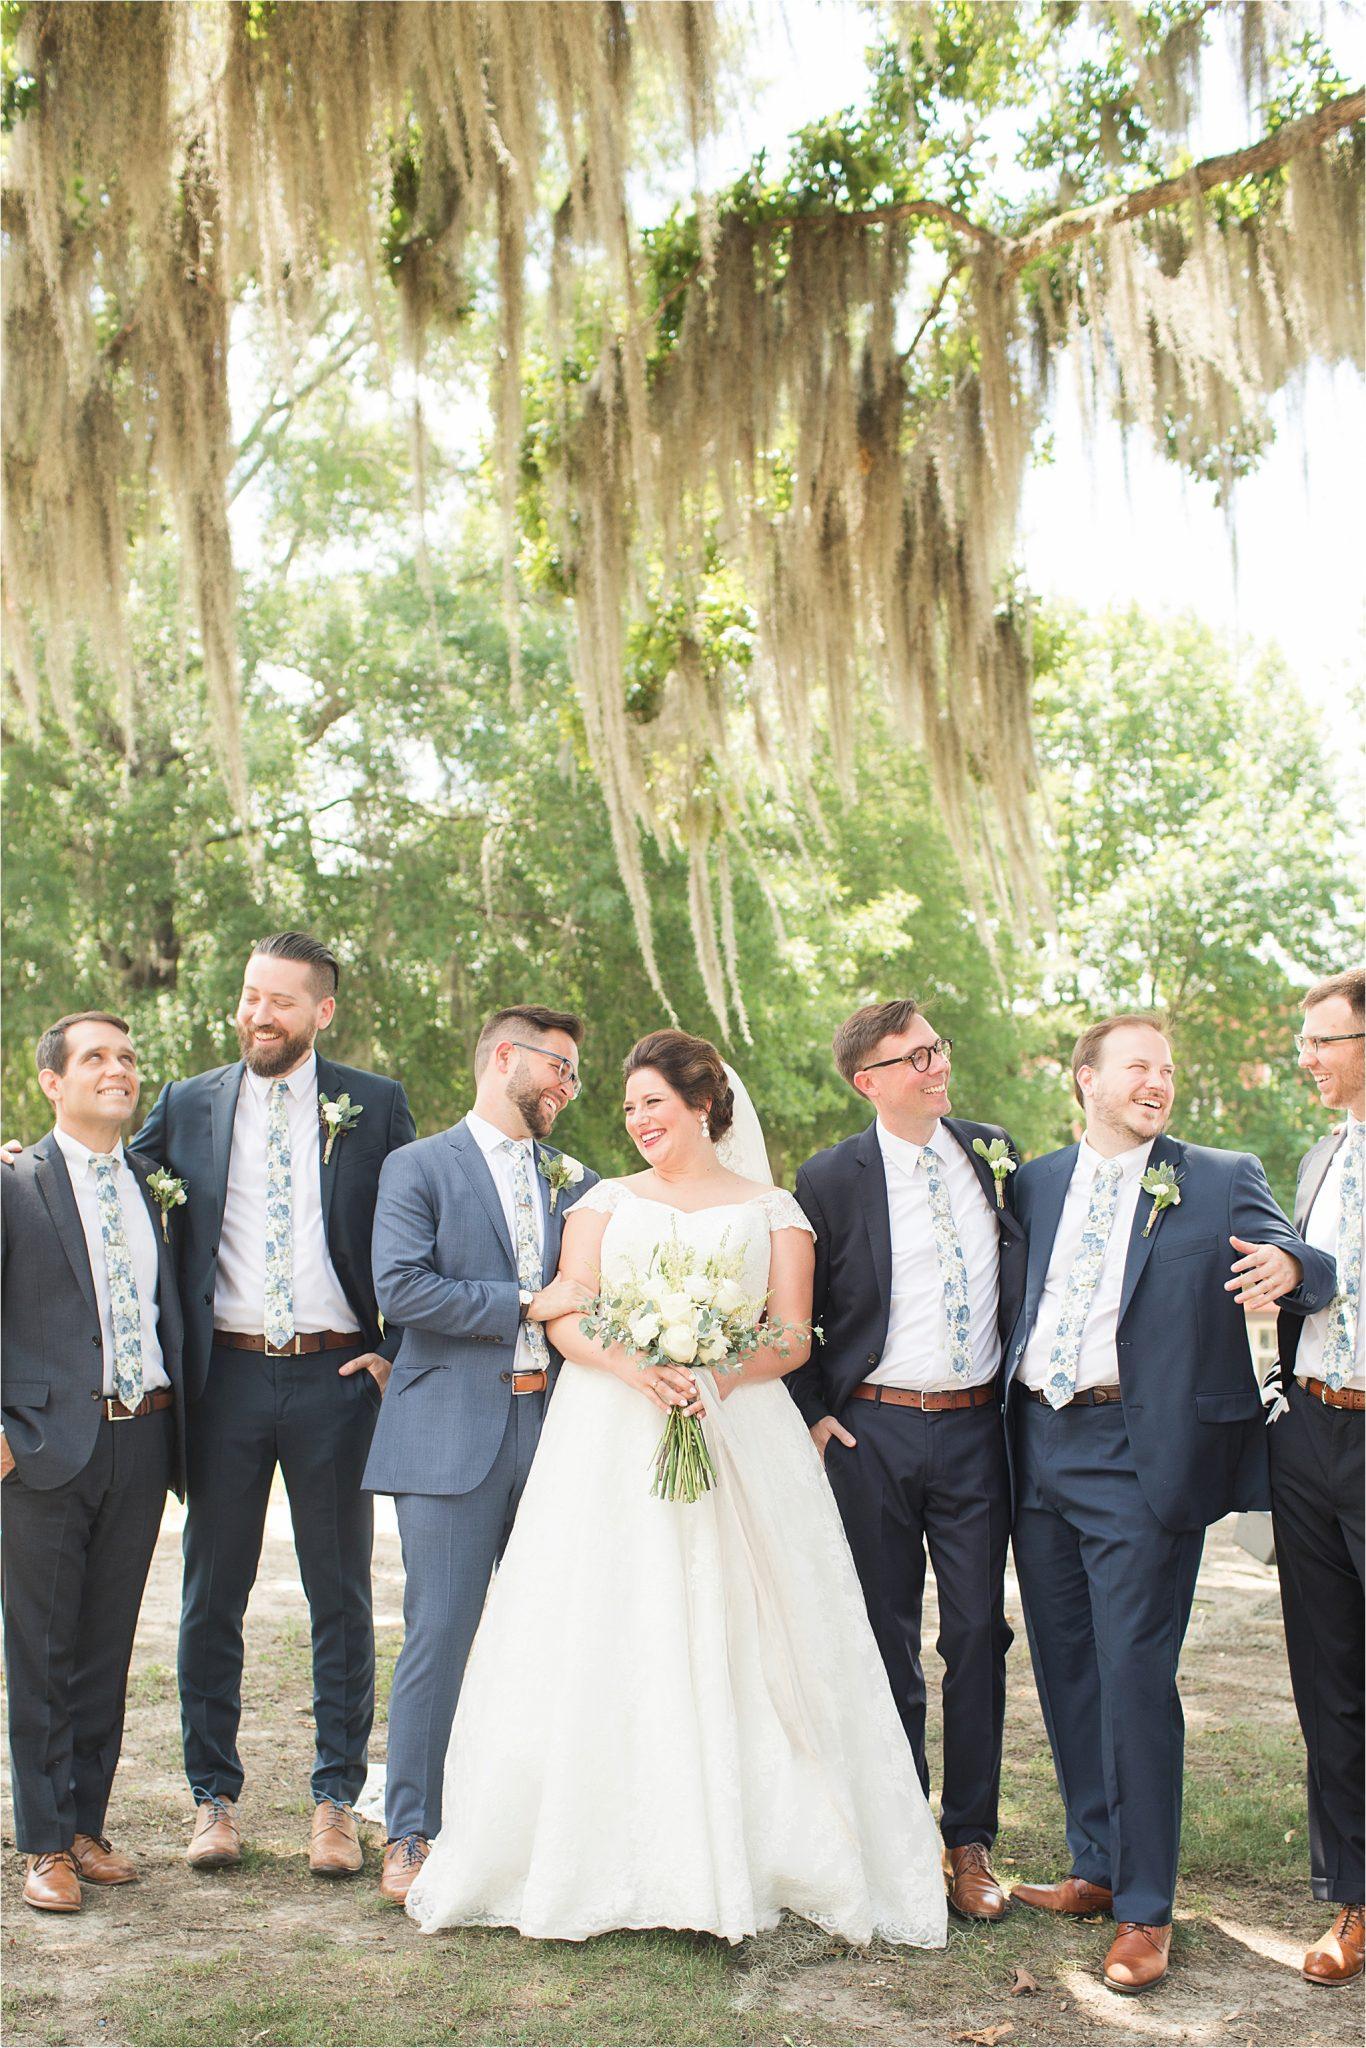 Pastel Themed Wedding-The Chapel at the Waters-Montgomery Alabama Photographer-Miles & Meredyth-Blue Themed Wedding-Navy Blue Groomsmen-Bride and groomsmen-Wedding Dress